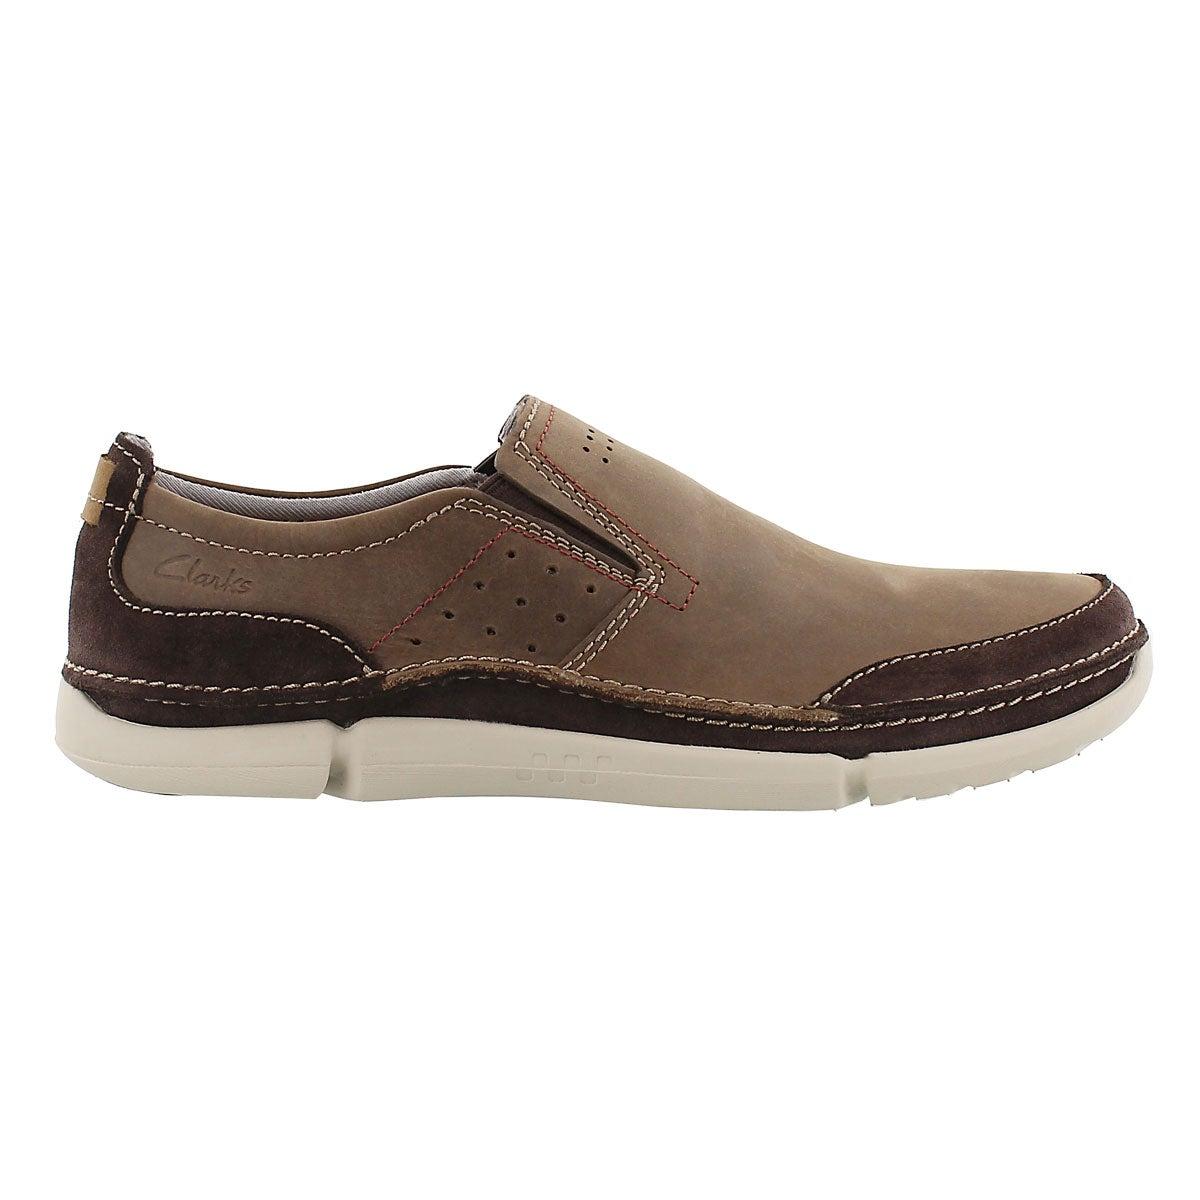 Fl�neur d�c. Trikeyon Step, brun, homme